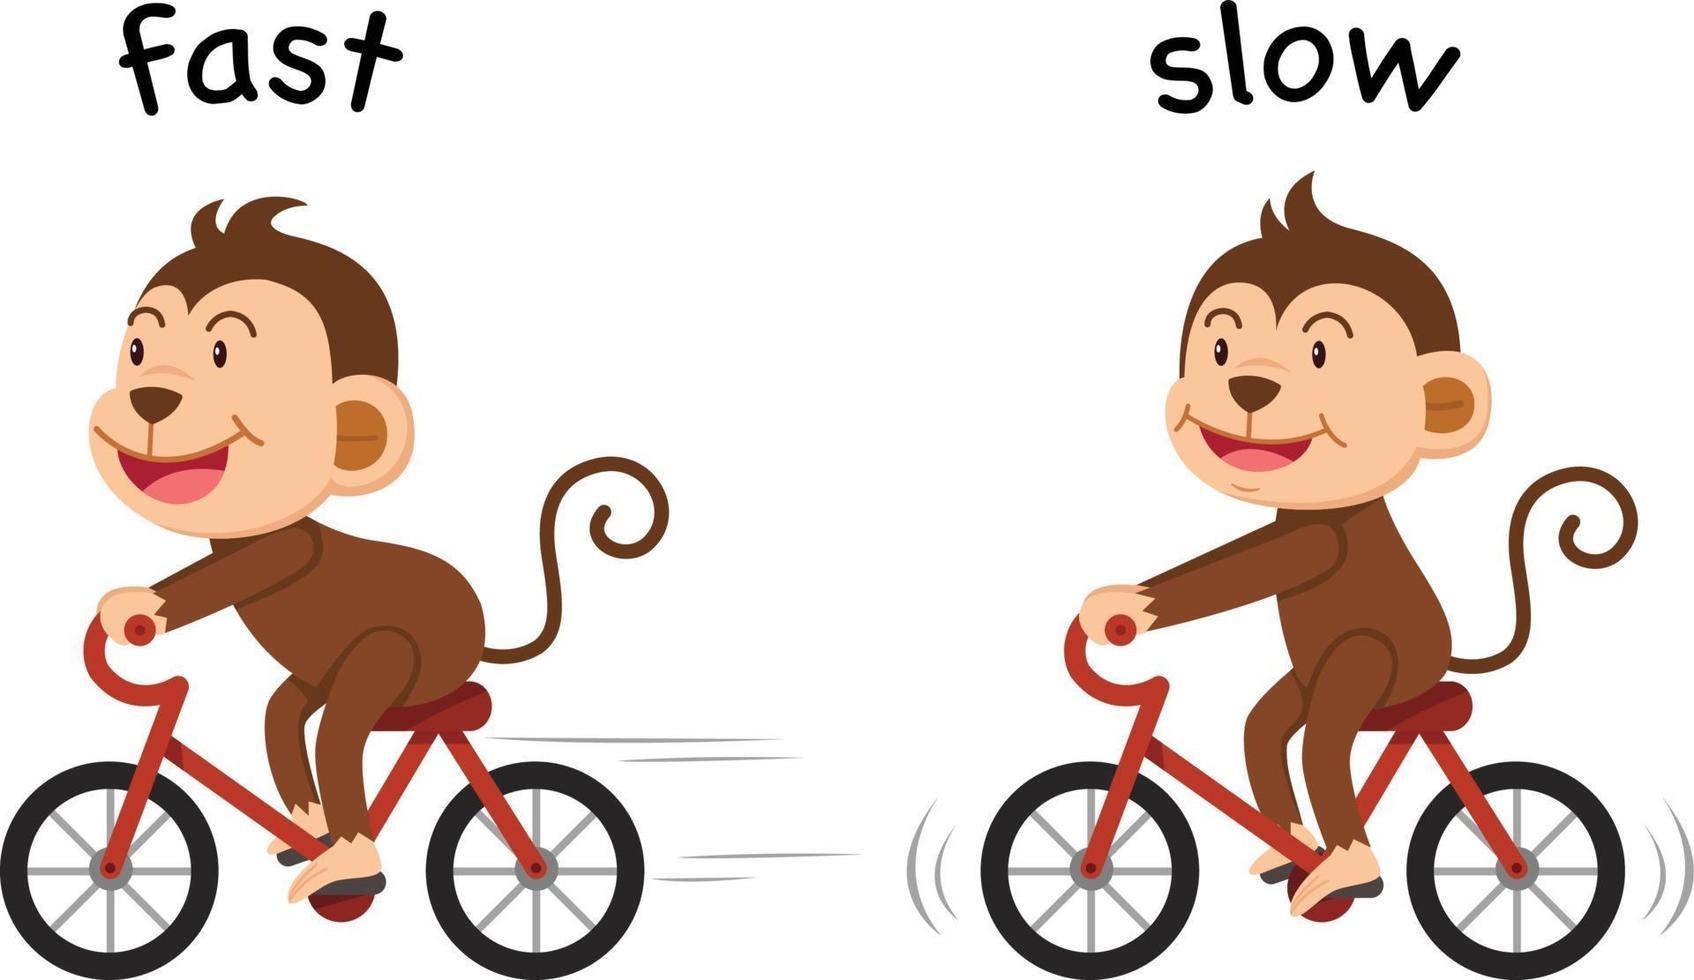 palavras opostas vetor rápido e lento